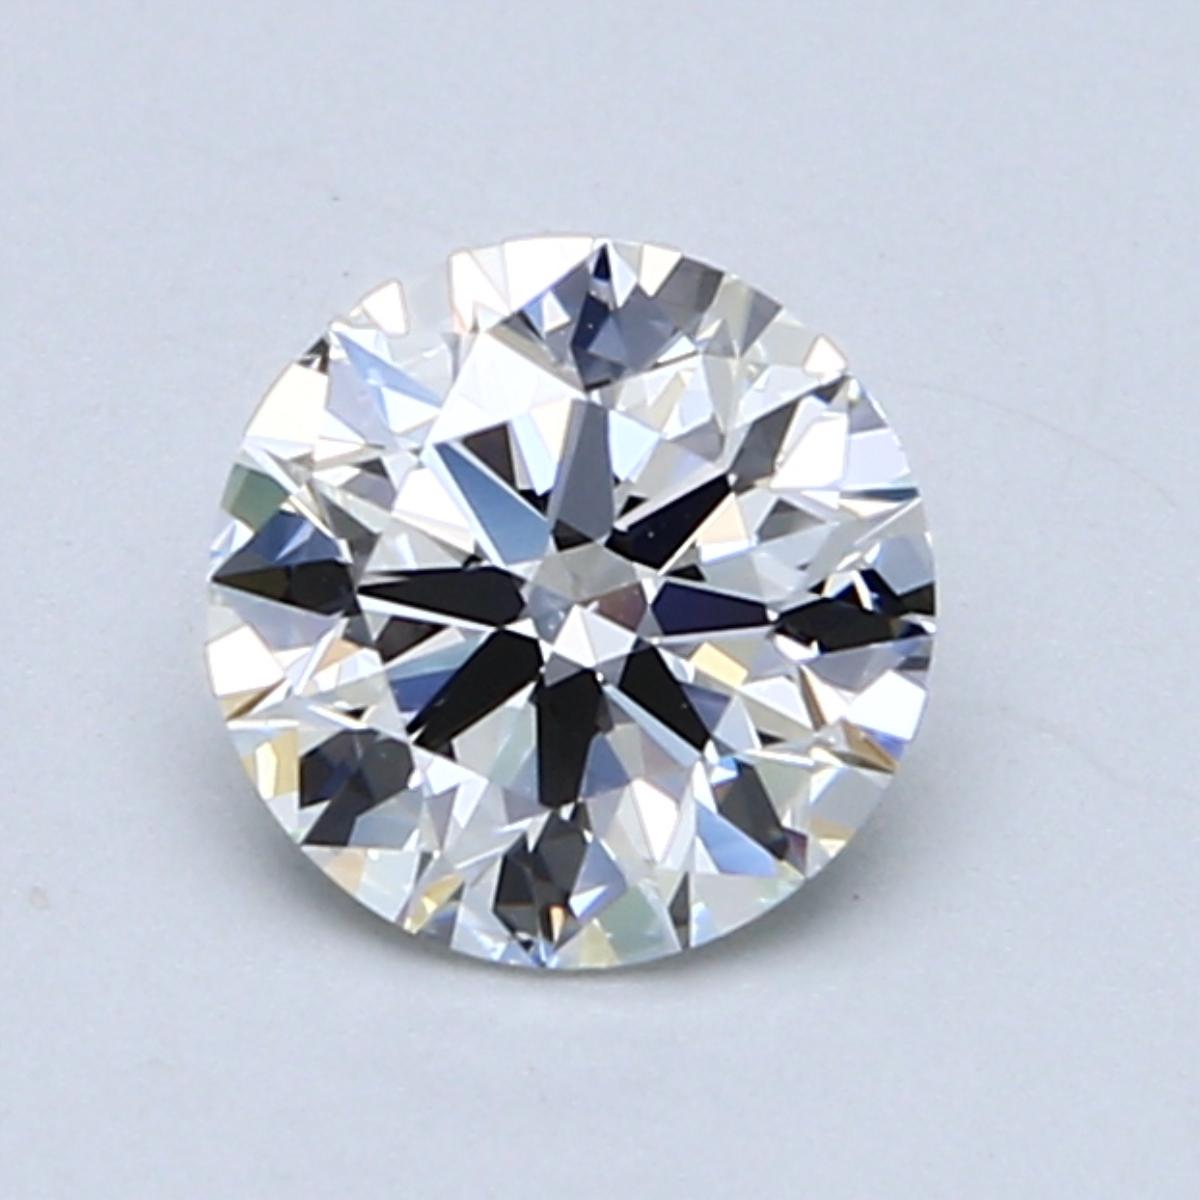 2.51 Carat E-VS1 Ideal Round Diamond